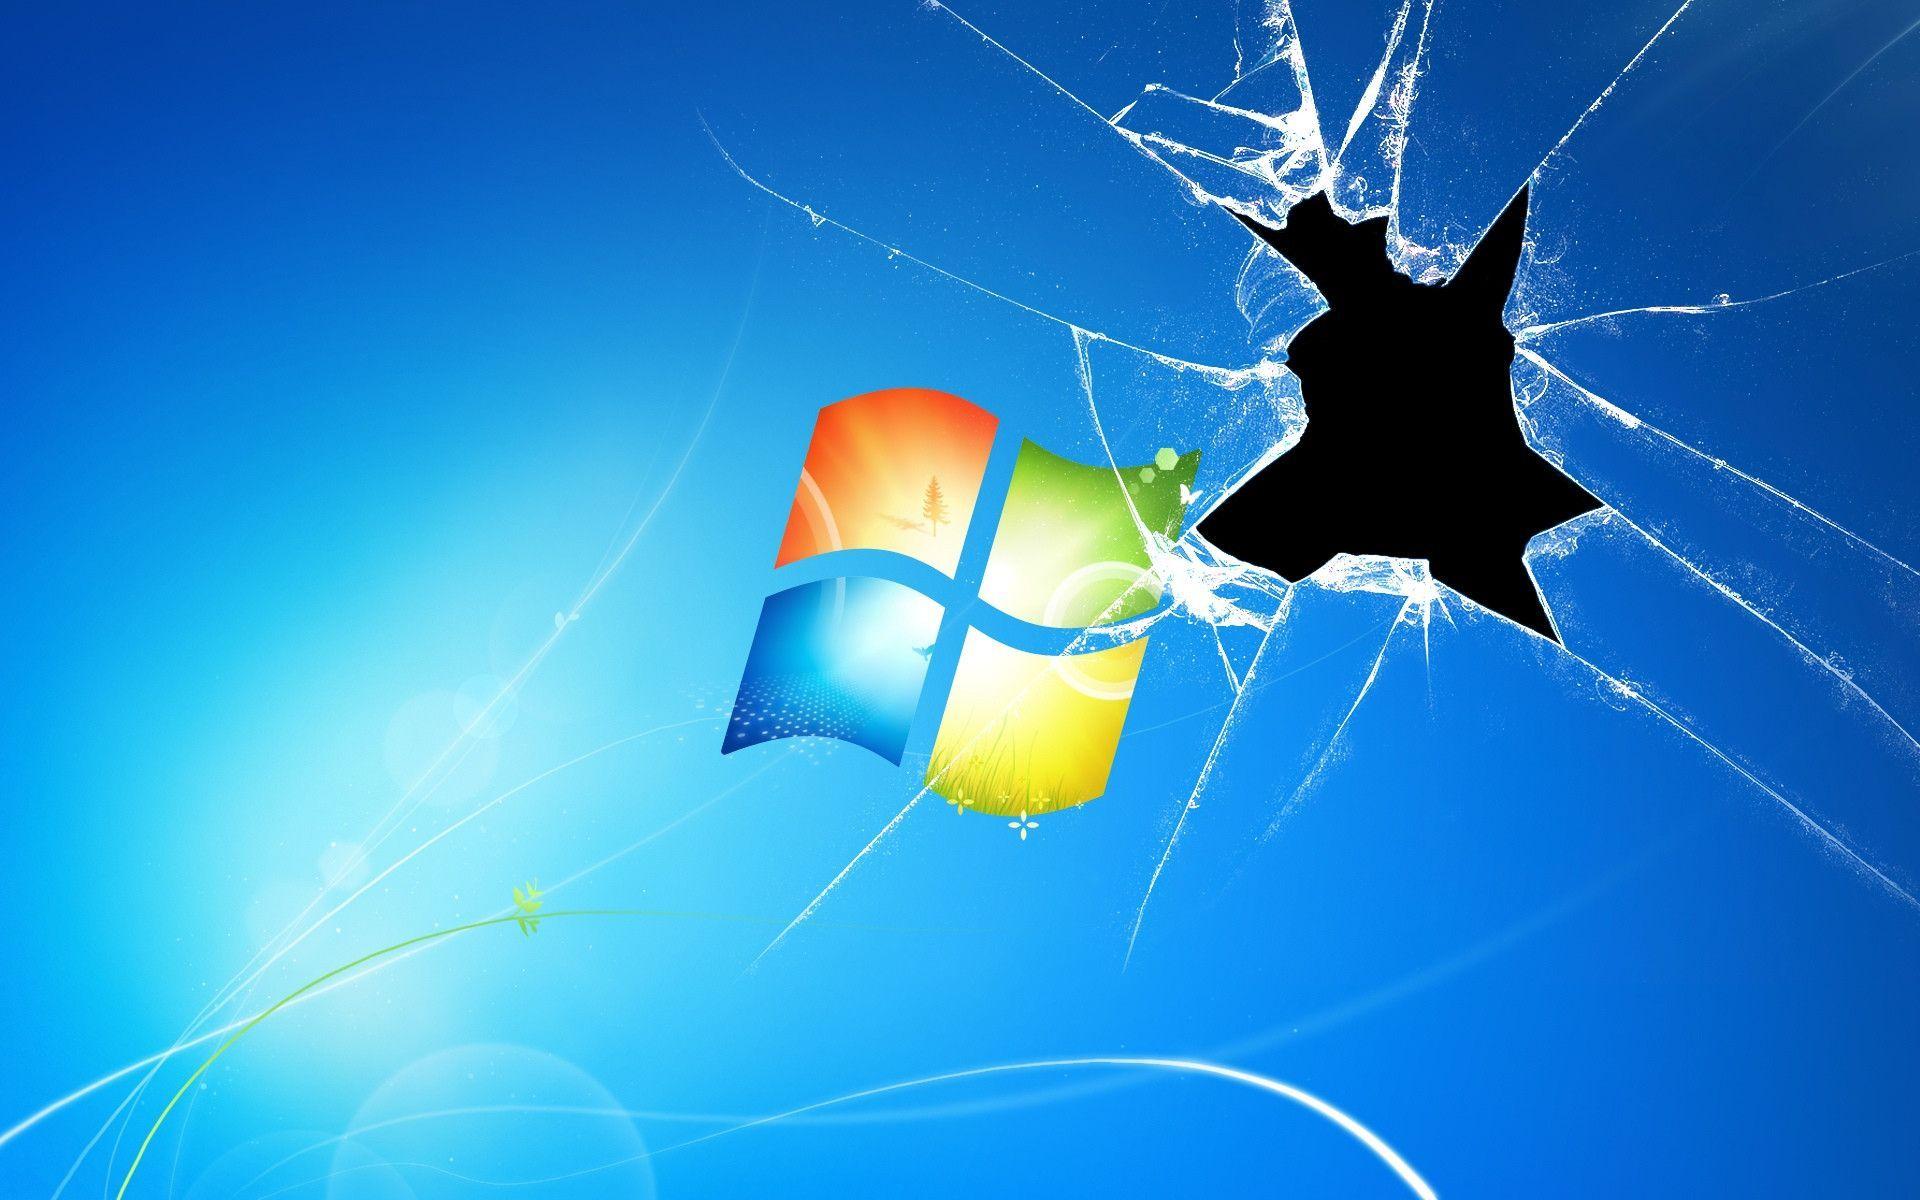 Wallpaper Broken Windows 19x10 Windows 壁紙 壁紙 デスクトップ 壁紙 Android